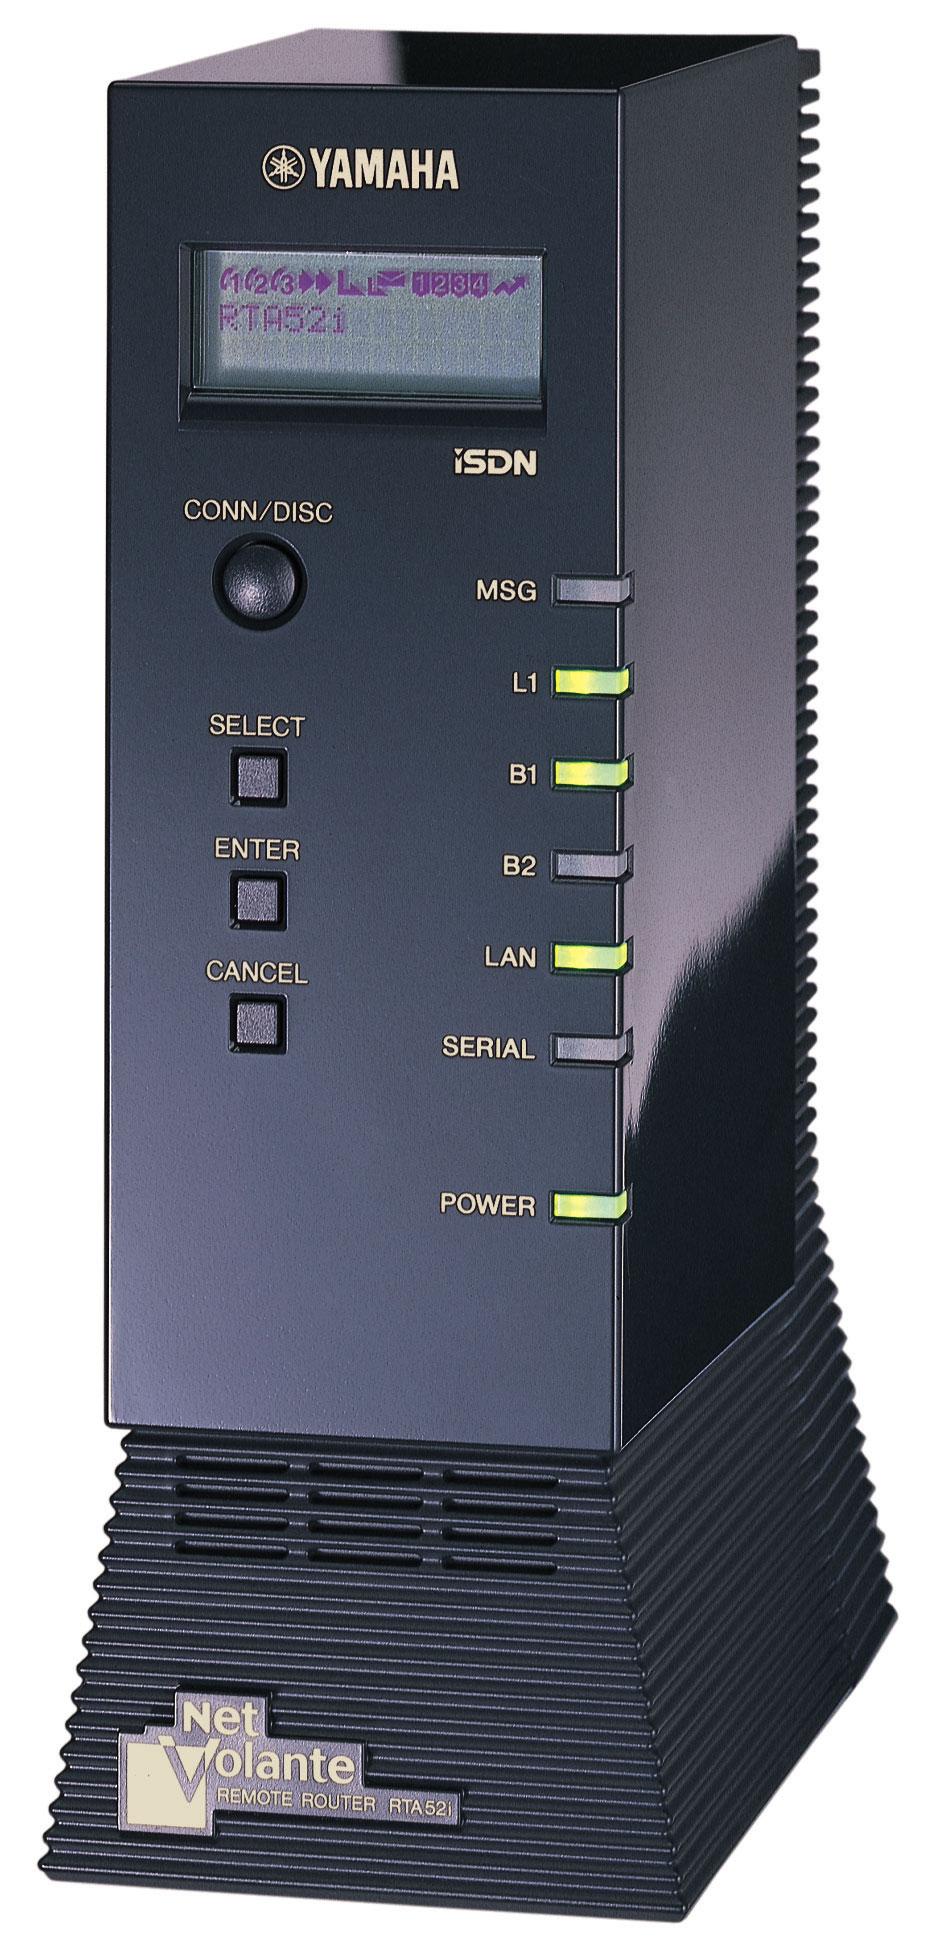 yamaha router ファームウェア